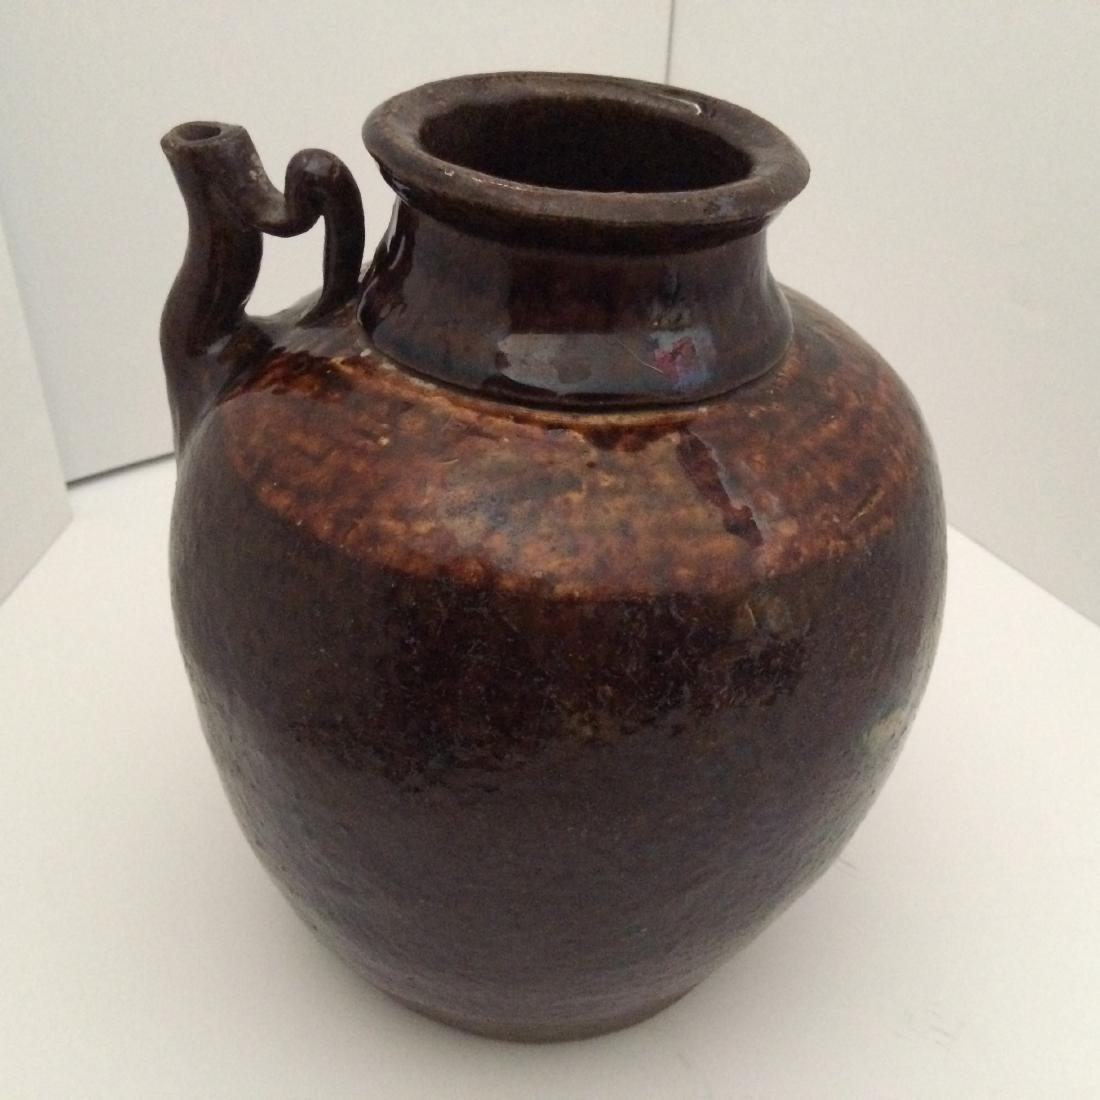 "Yuan Dynasty Ware Pot (9""H)"